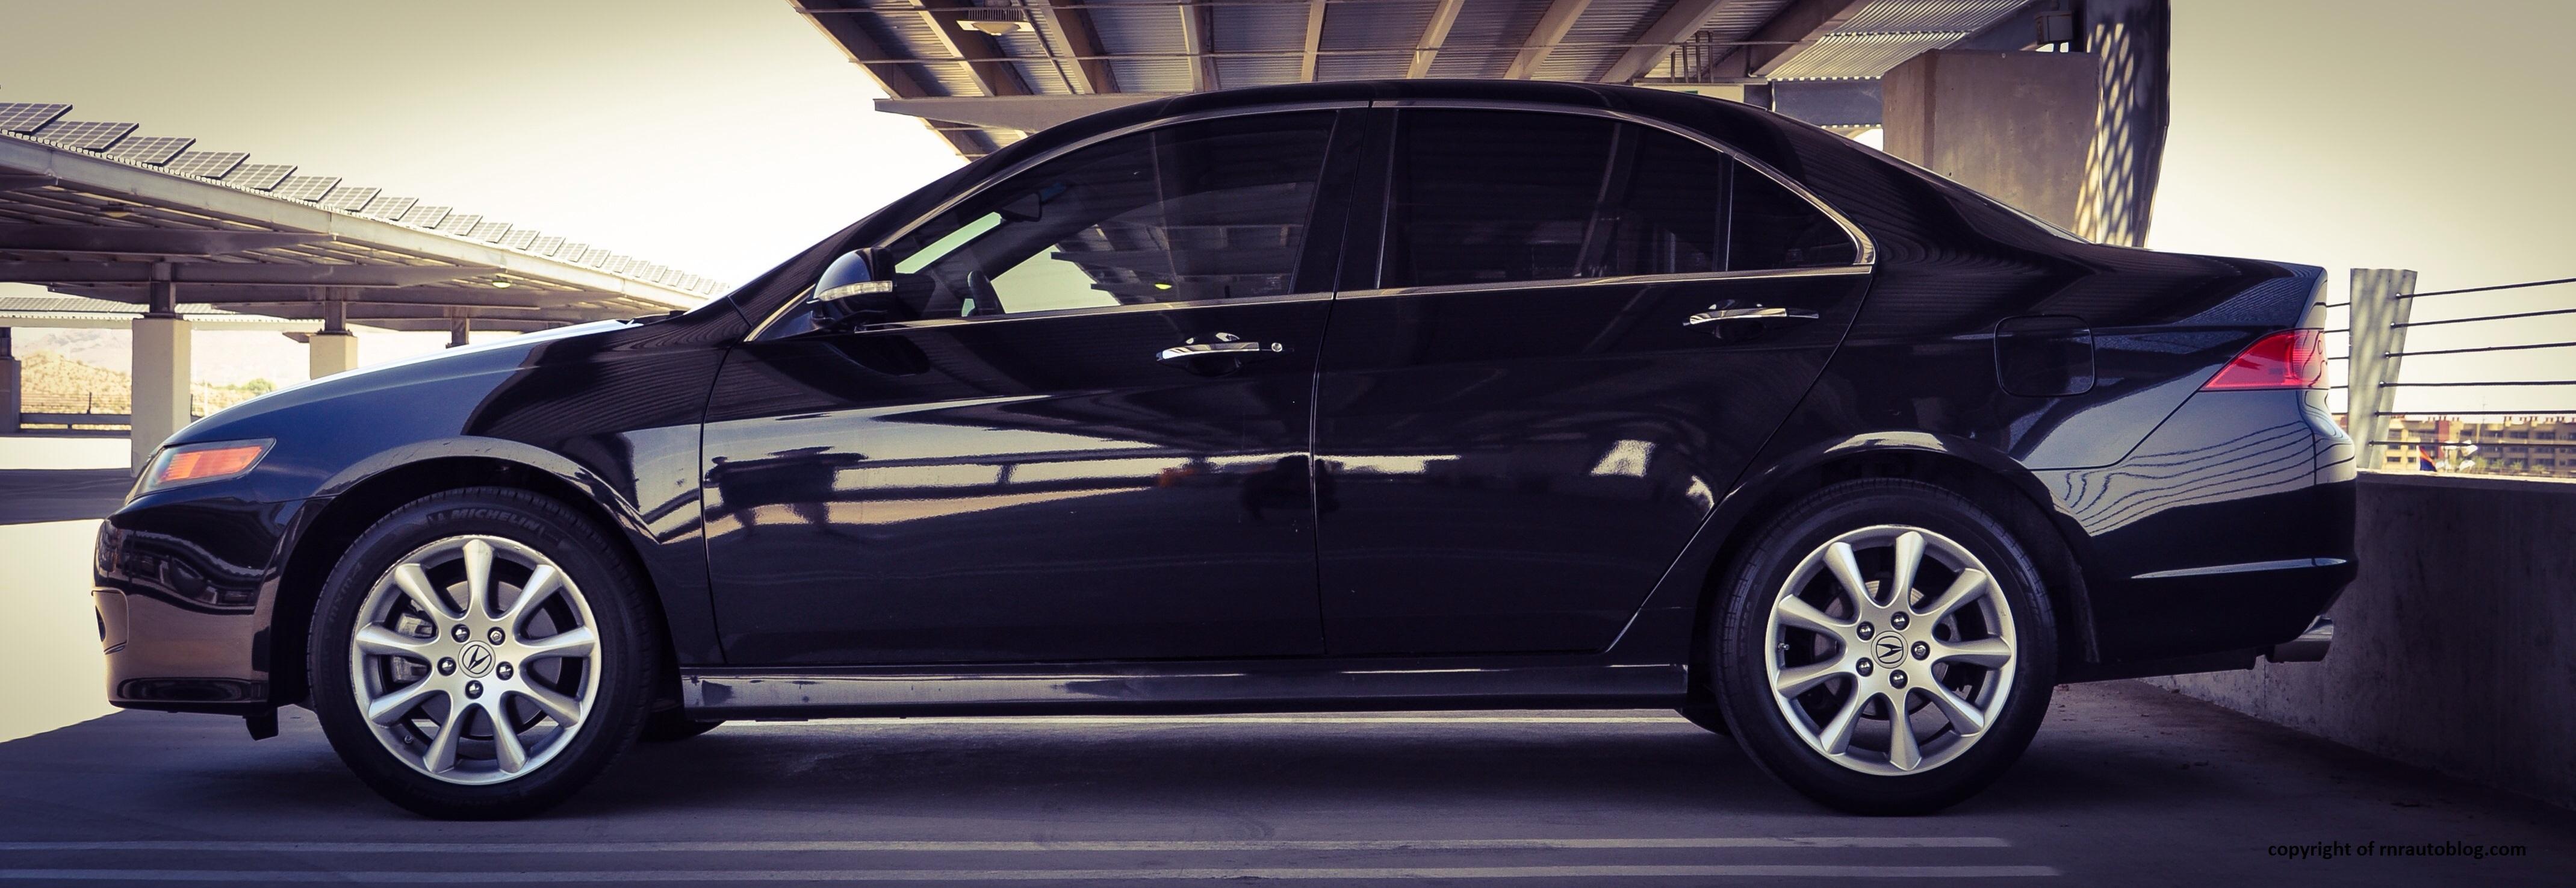 2008 Acura Tsx Review Rnr Automotive Blog